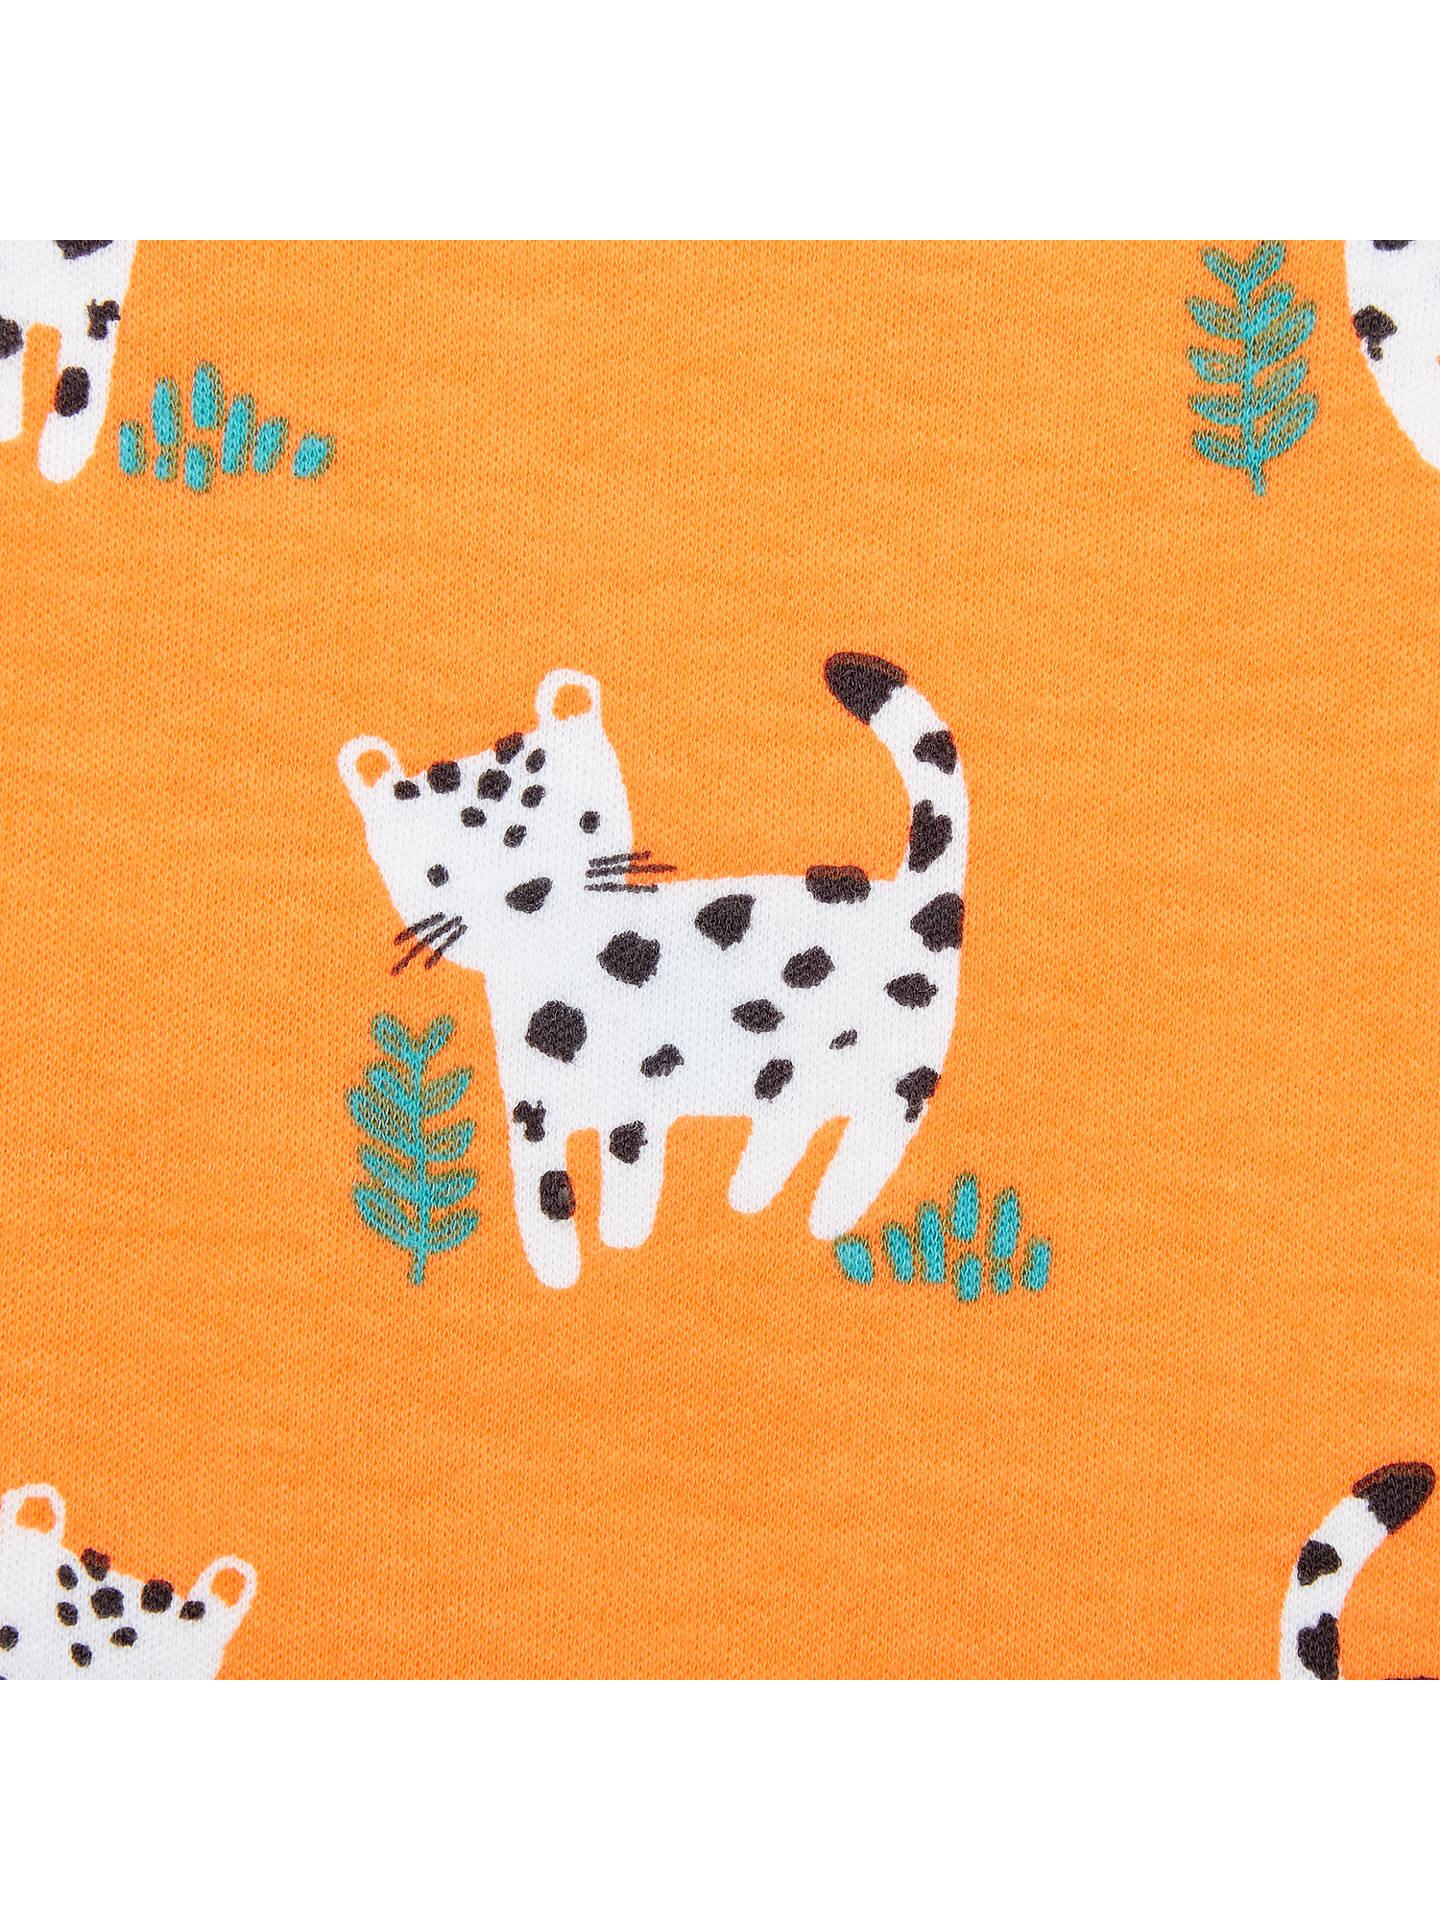 5456c6cf0ce9 ... Buy John Lewis   Partners Baby Leopard Romper Playsuit